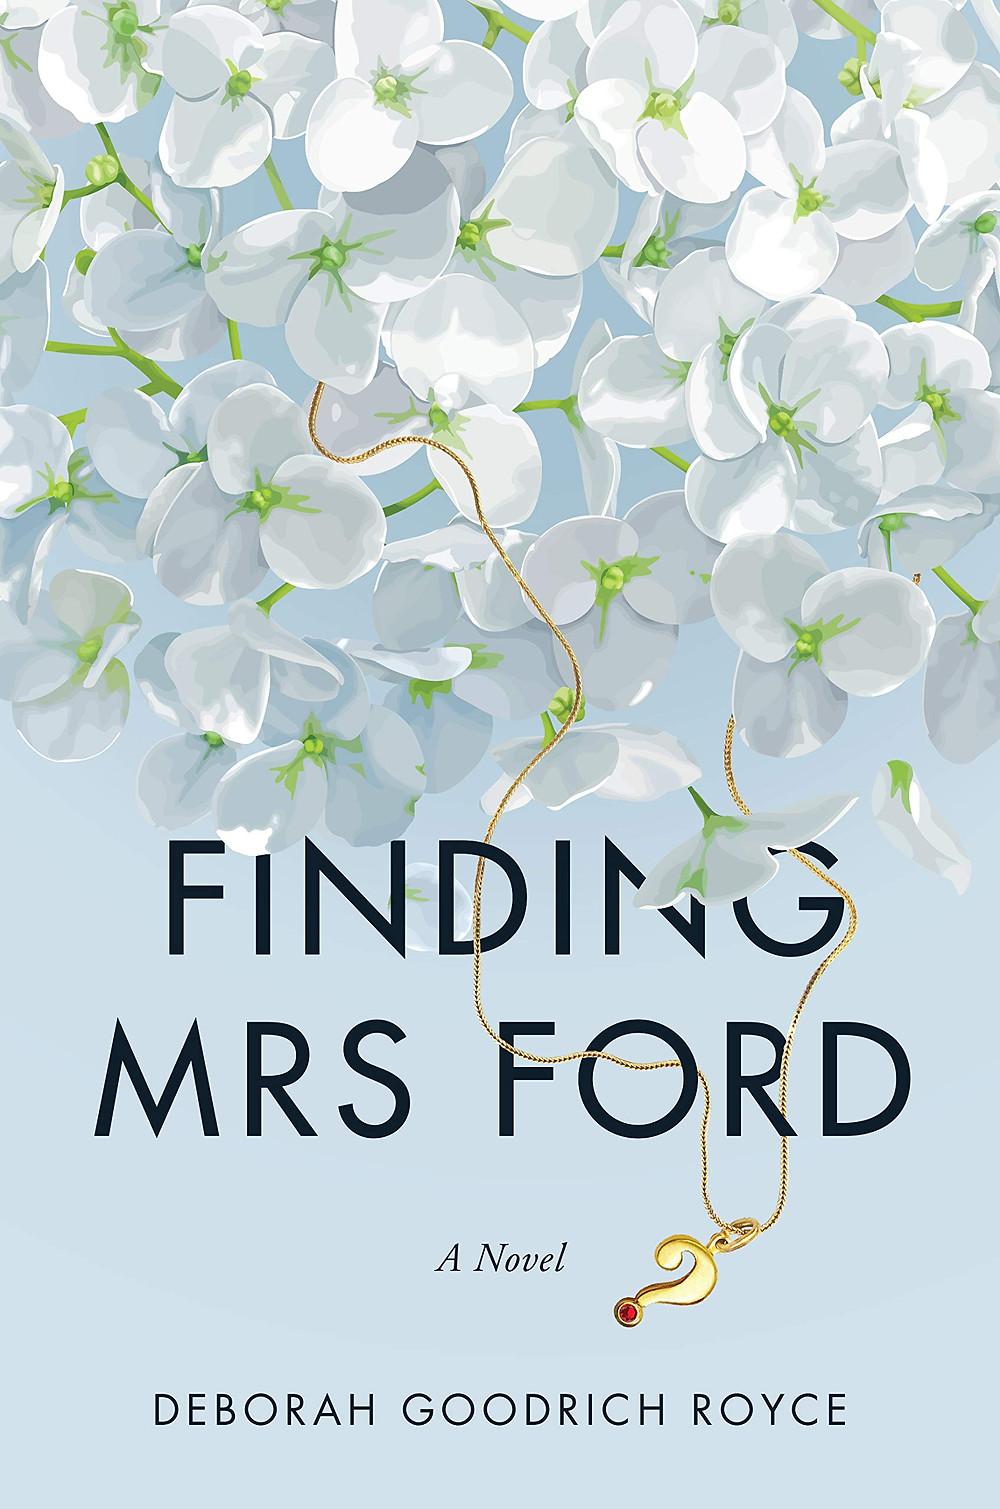 Kaylie Abela Art Reading List Femme Deborah Goodrich Royce Finding Mrs. Ford